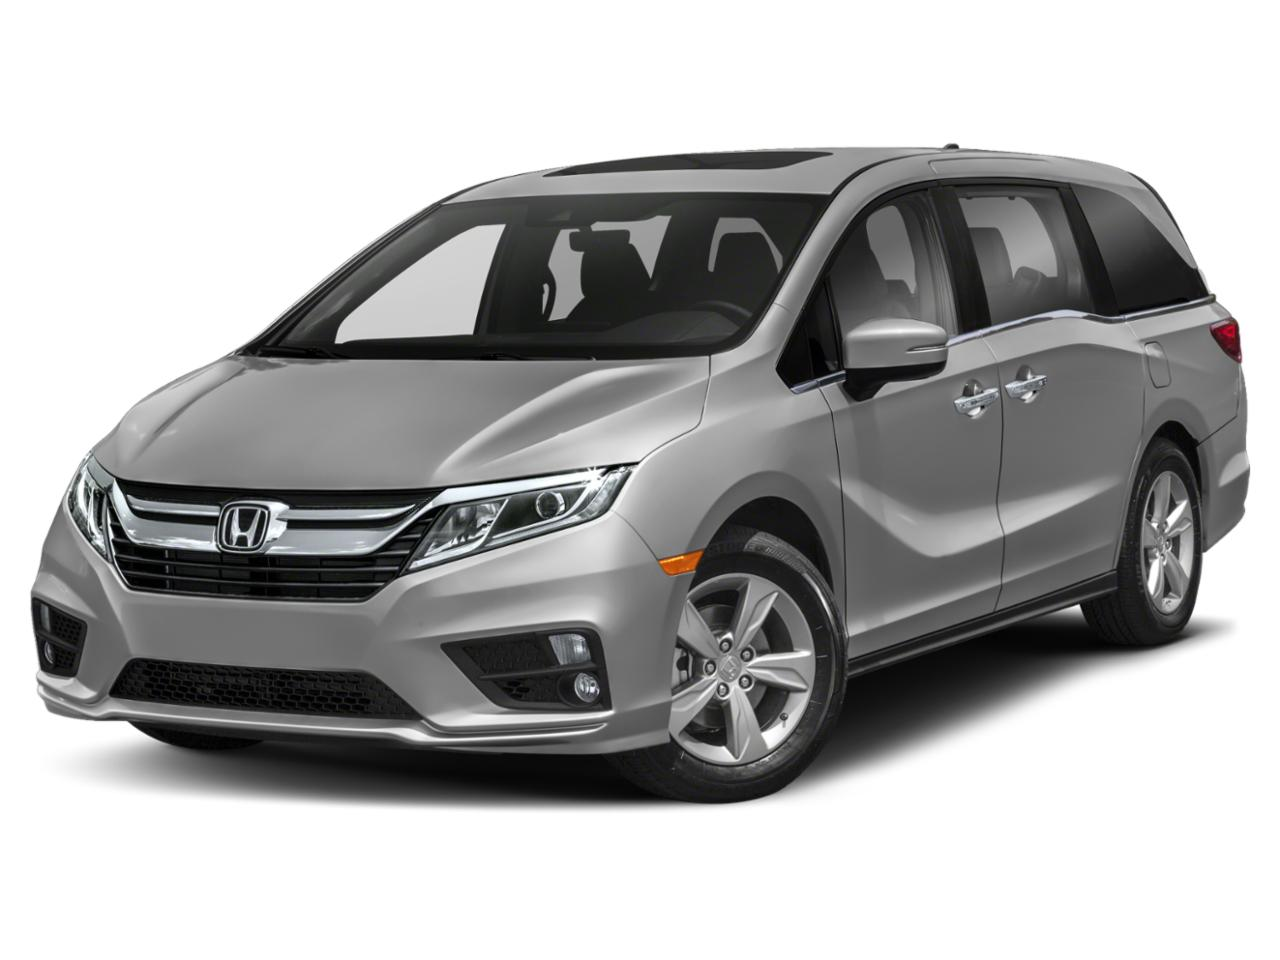 2020 Honda Odyssey Vehicle Photo in San Antonio, TX 78238